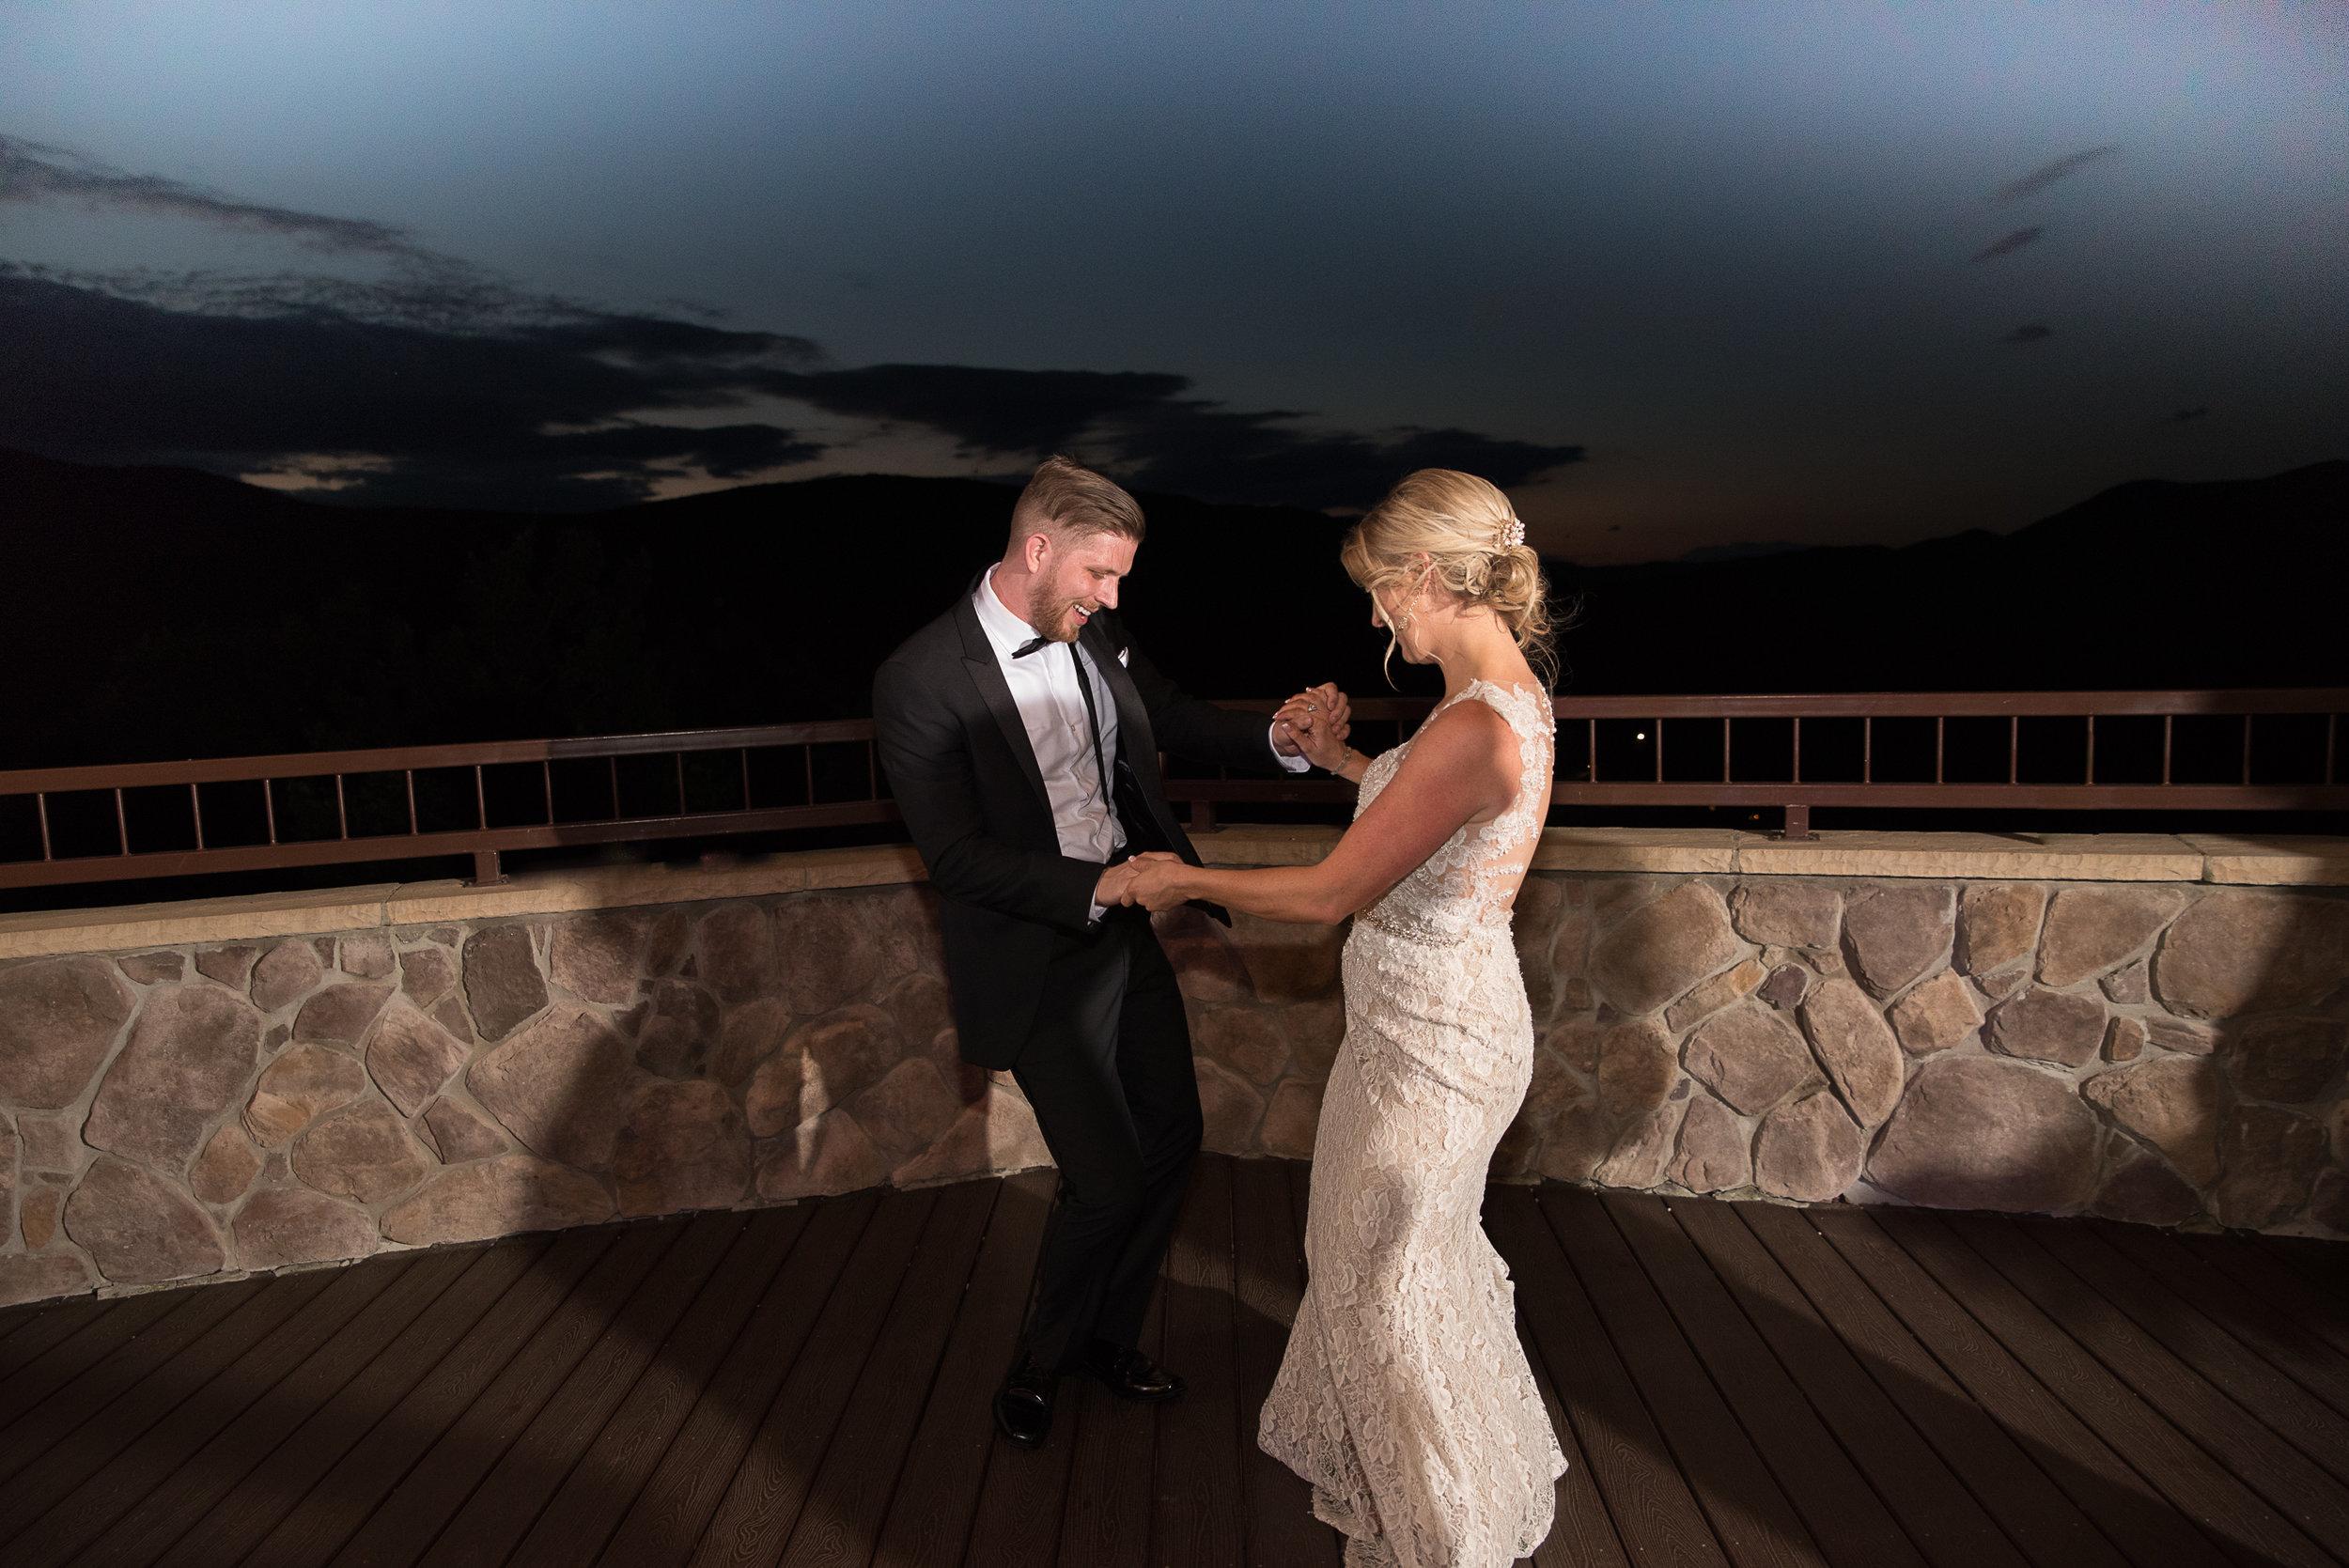 Lexington-VA-Wedding-House-Mountain-Inn-1-30.jpg